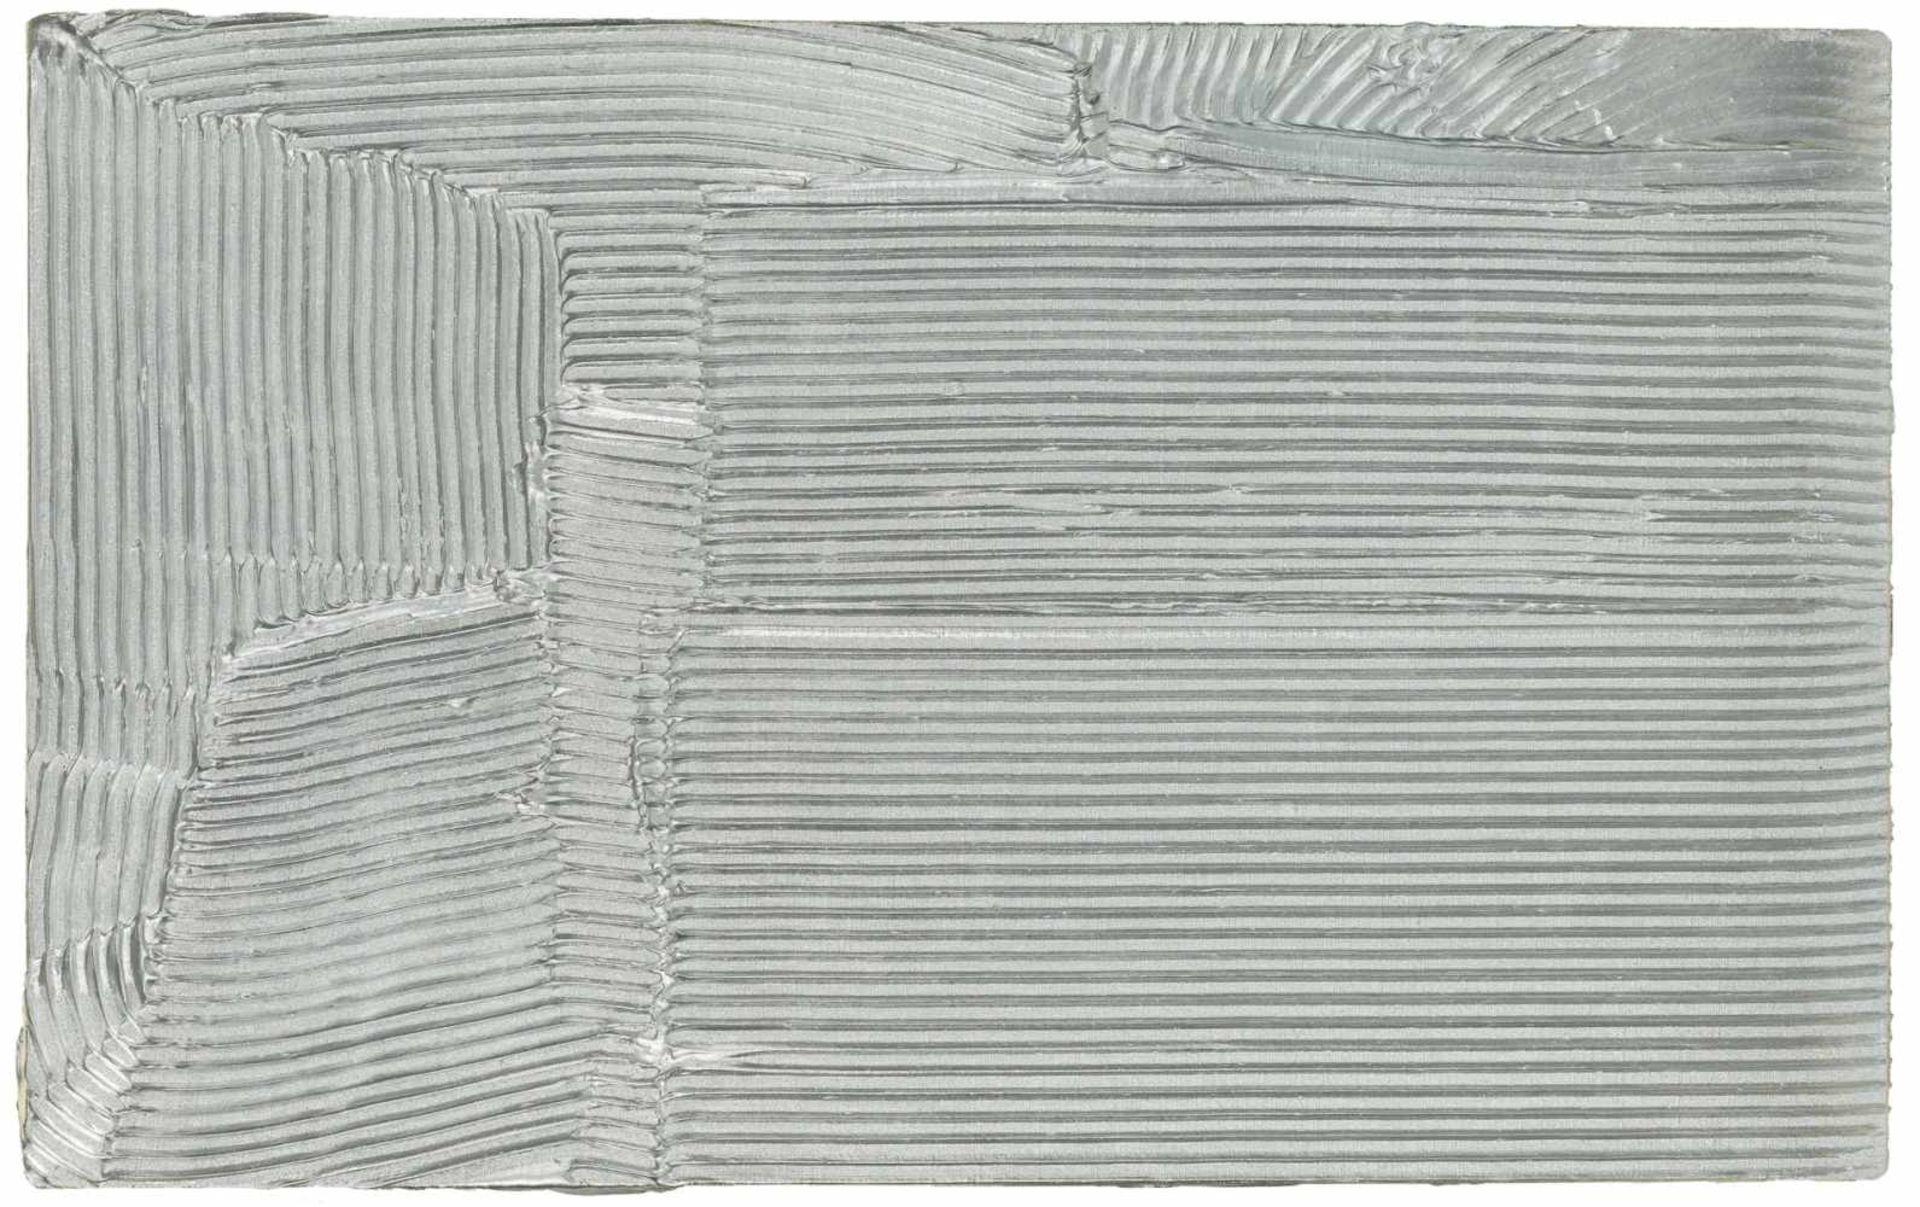 Los 42 - Jakob Gasteiger Salzburg 1953 geb. Ohne Titel (8.11.2008) Acryl und Aluminium auf Leinwand 55 x 88,5